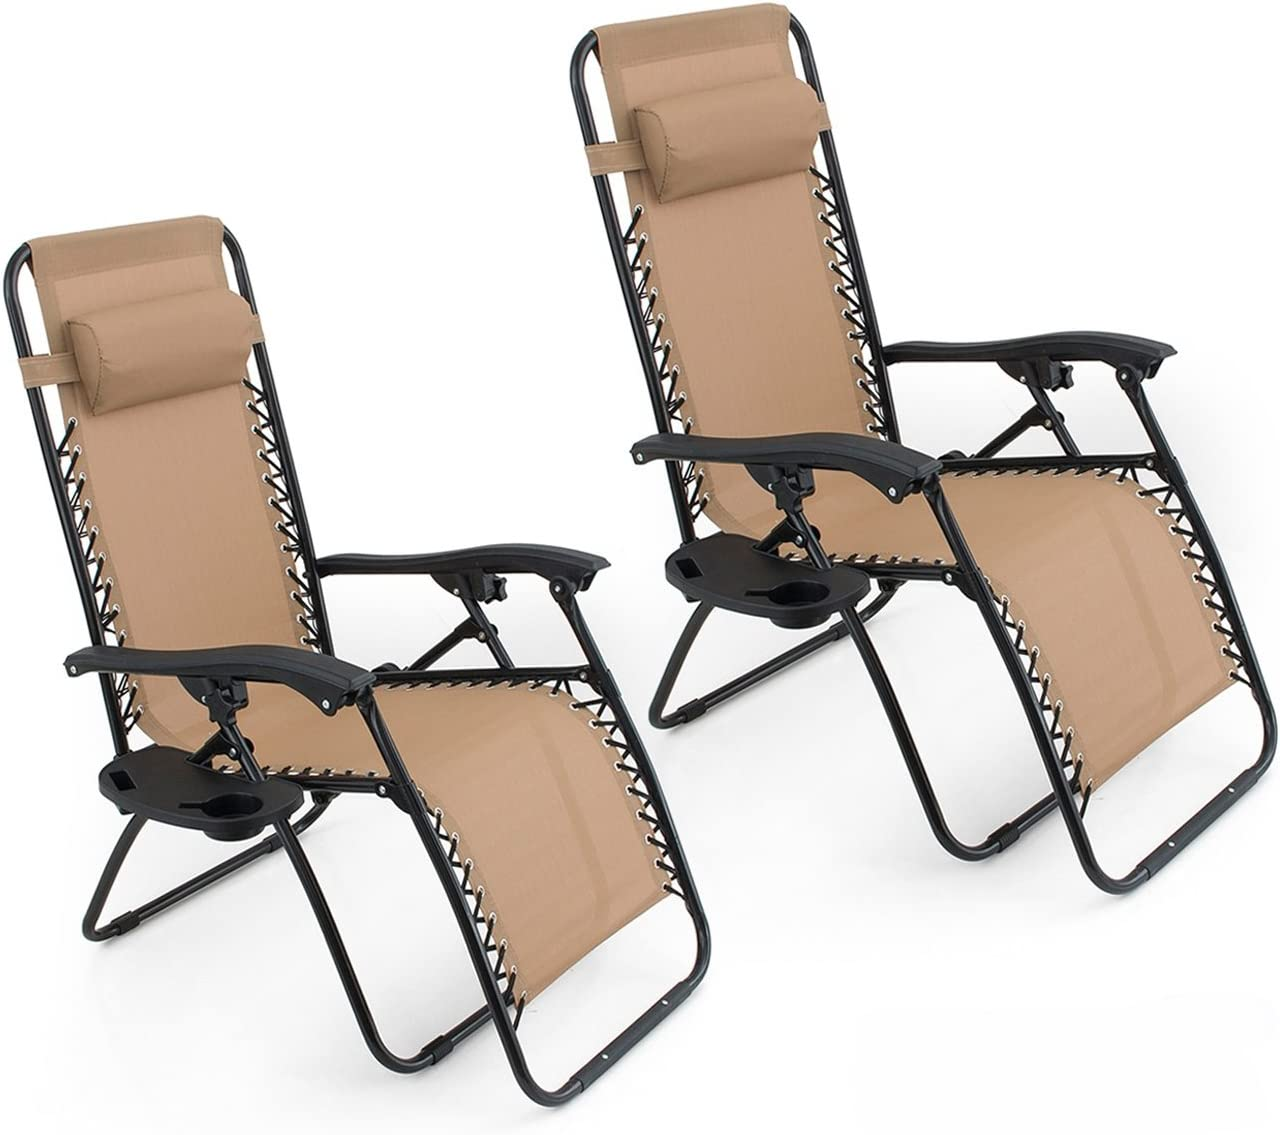 BELLEZE Set of 2 Anti Zero Gravity Chairs w Tray Cup Holder Rust Resistant Lightweight Patio Garden Chair, Beige